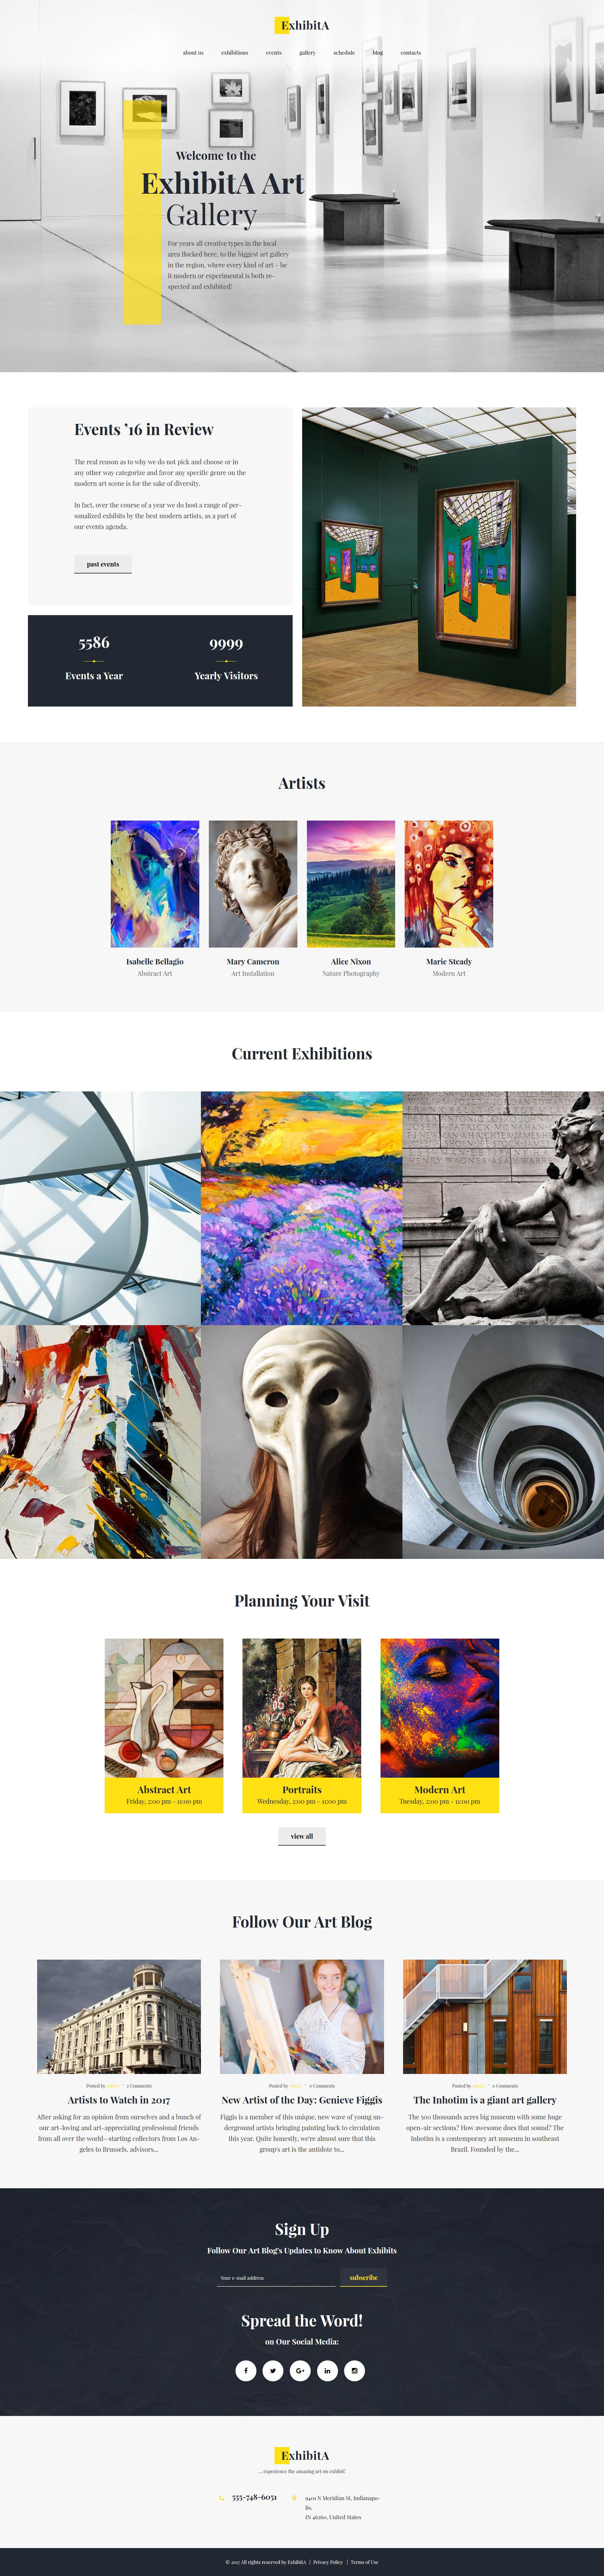 """ExhibitA - Art Gallery Responsive"" - адаптивний WordPress шаблон №62373 - скріншот"